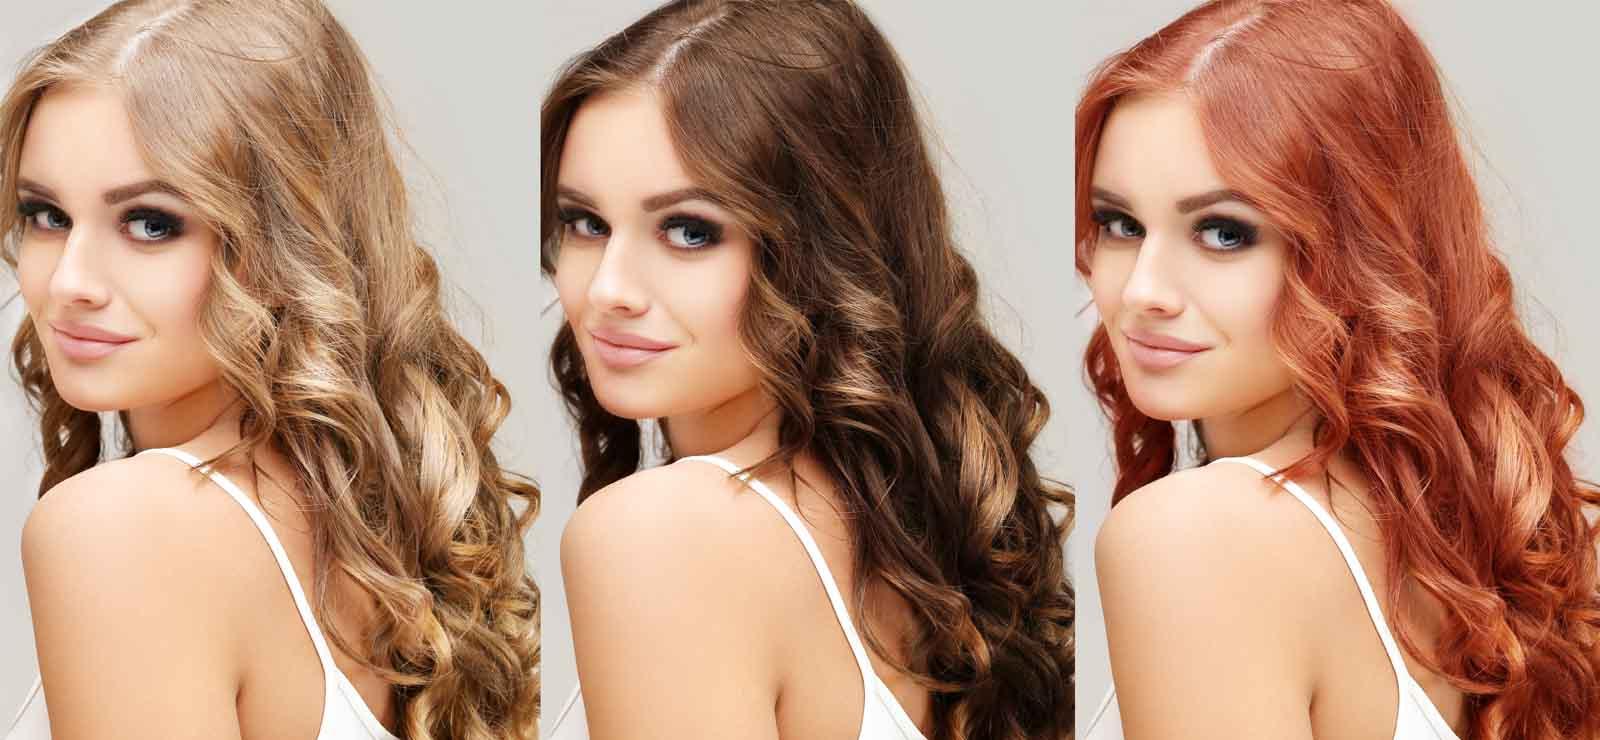 Aplicación cambiar color de pelo